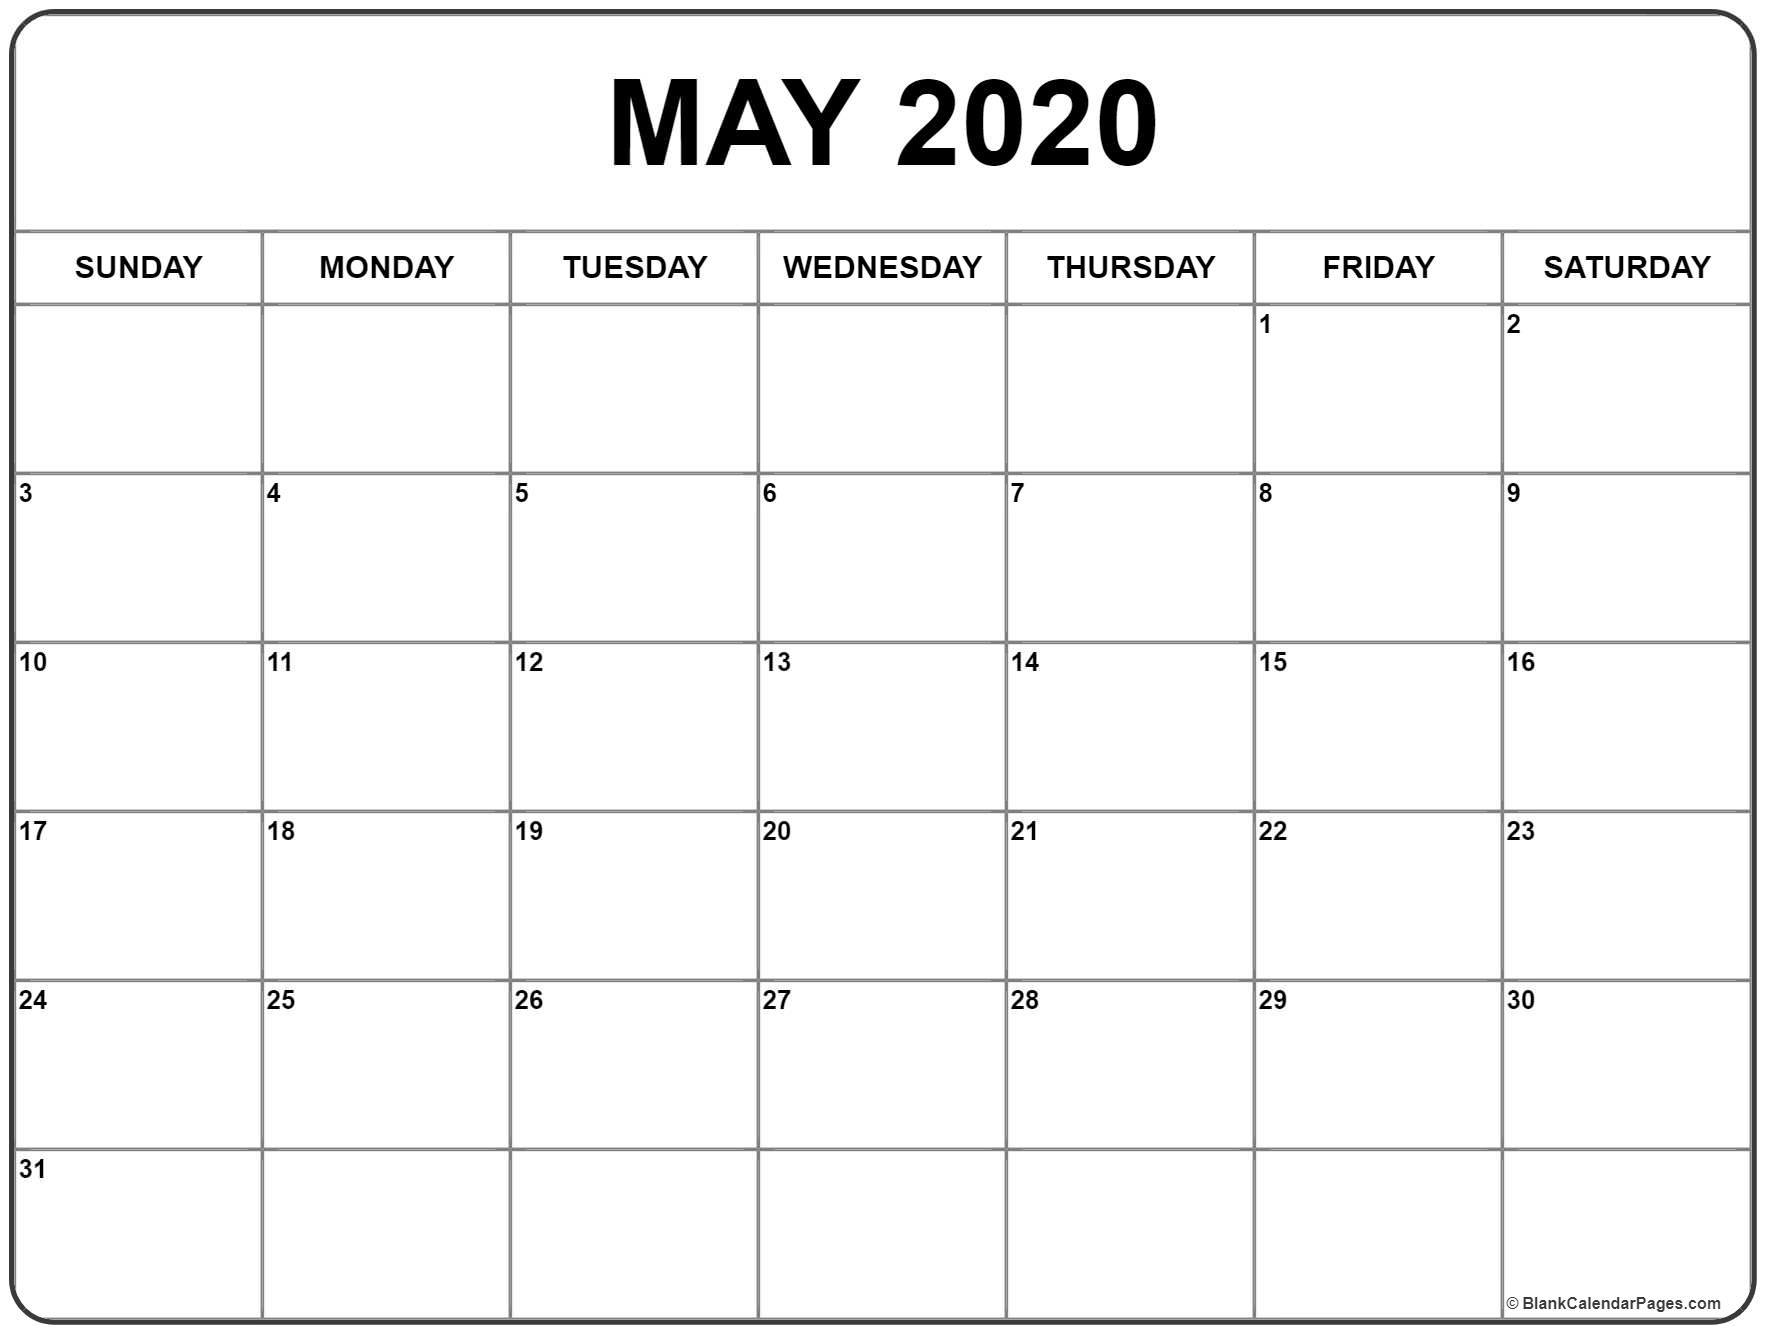 May 2020 Calendar | Free Printable Monthly Calendars within Printable 2020 Calendar